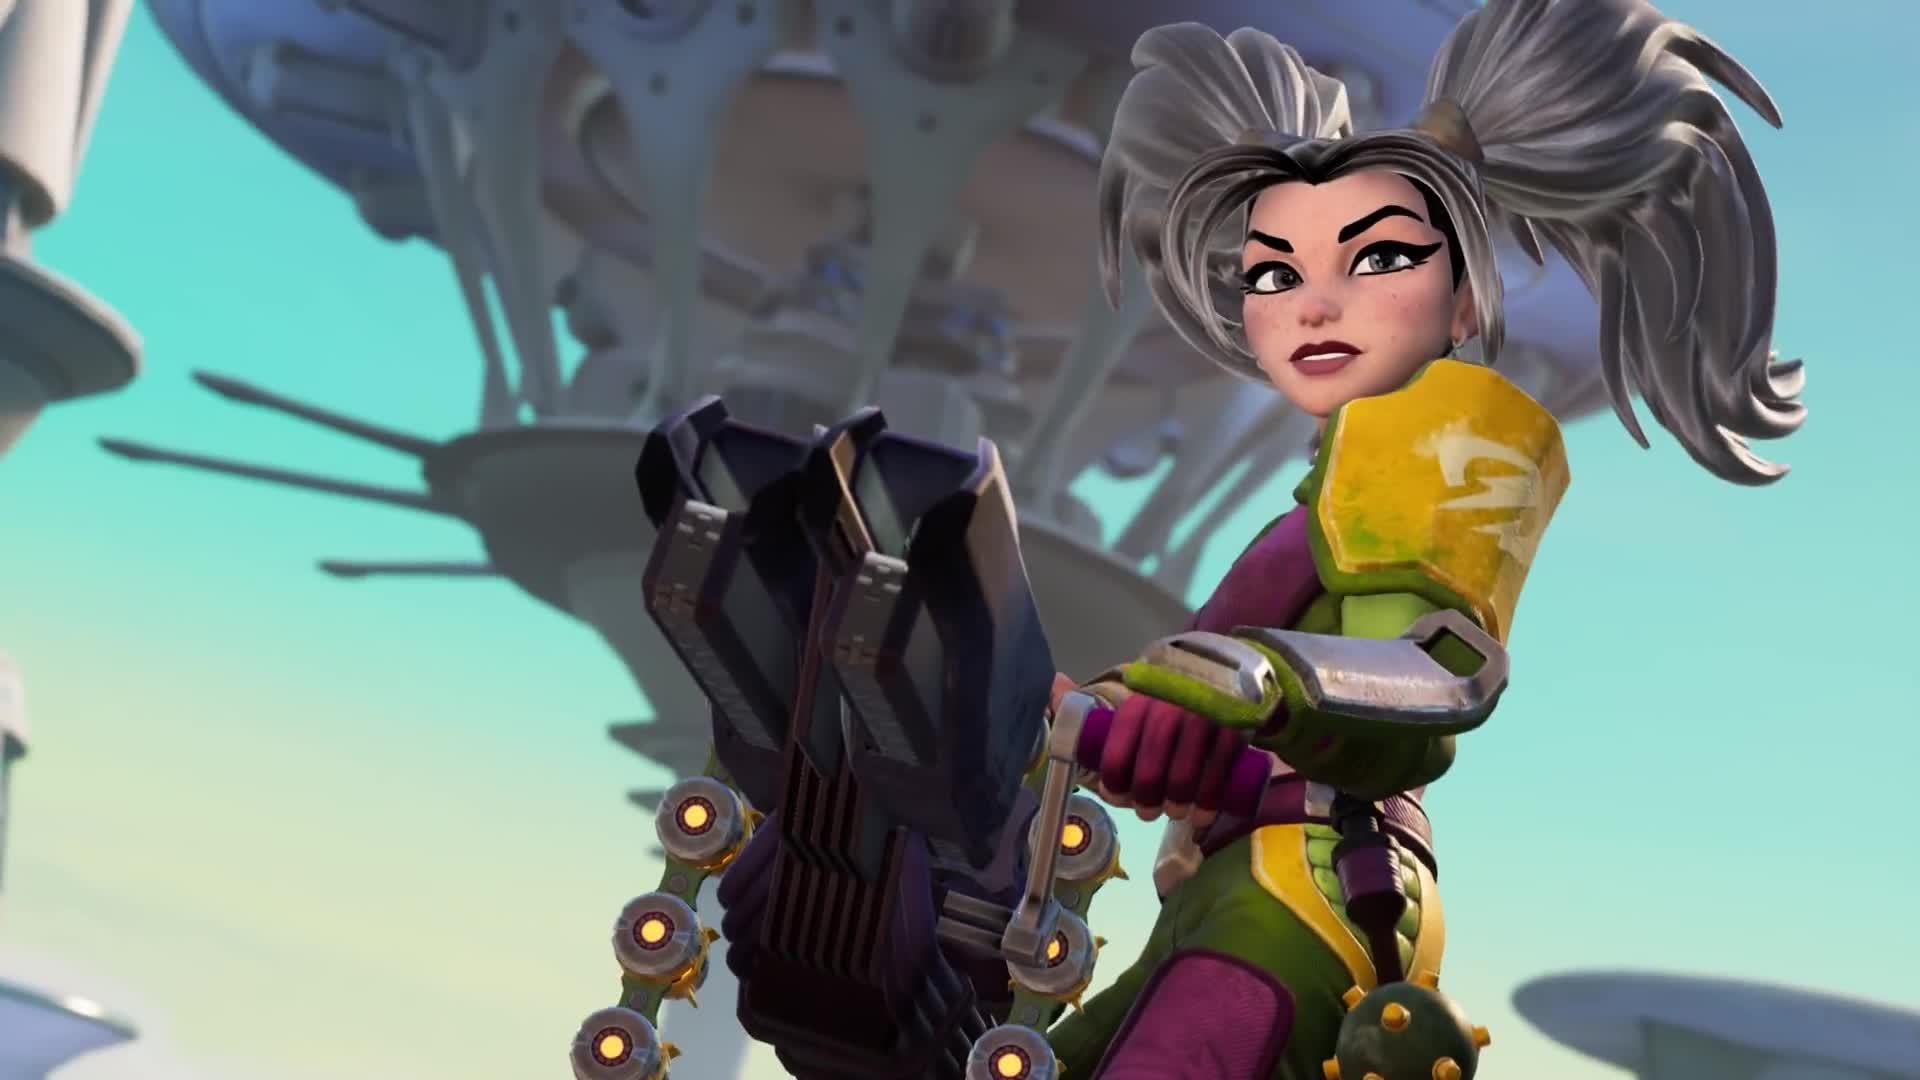 Trailer, Electronic Arts, Ea, Shooter, Online-Spiele, Rocket Arena